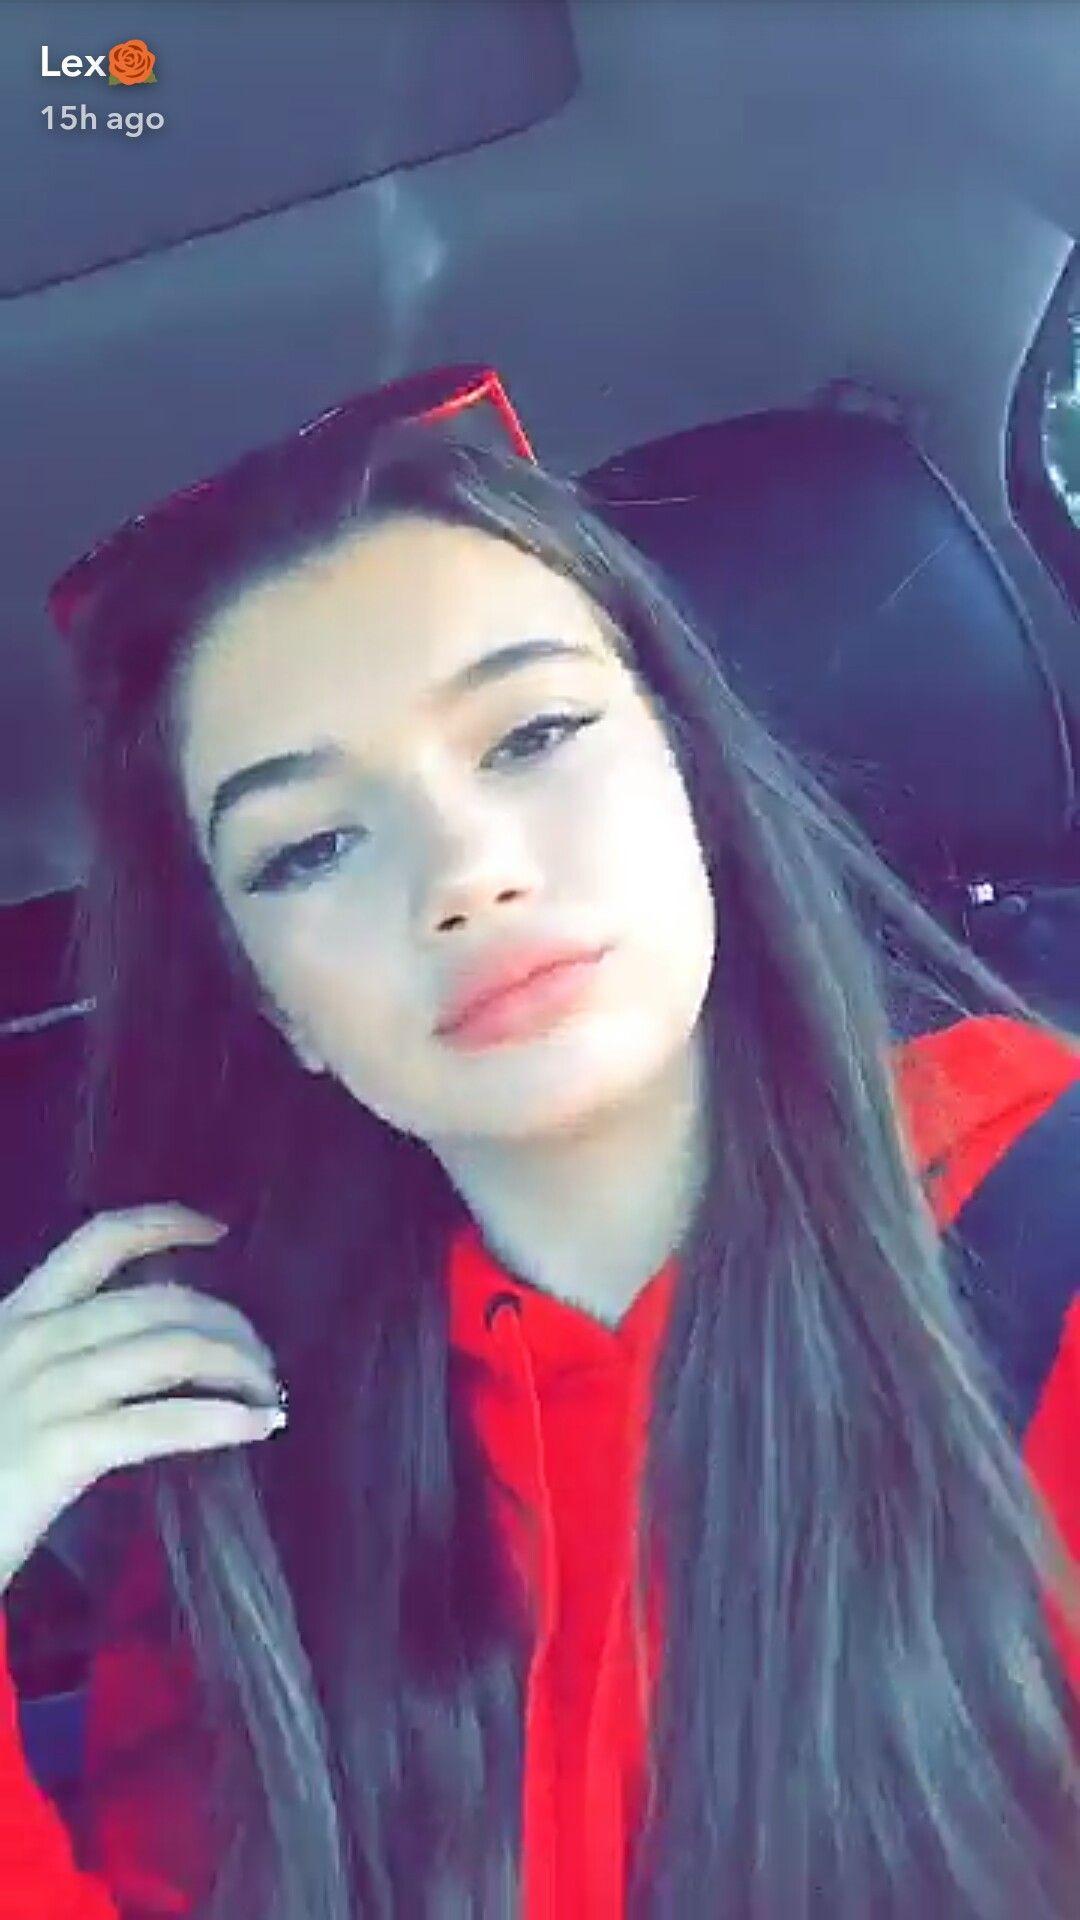 Snap cute girl LovePanky